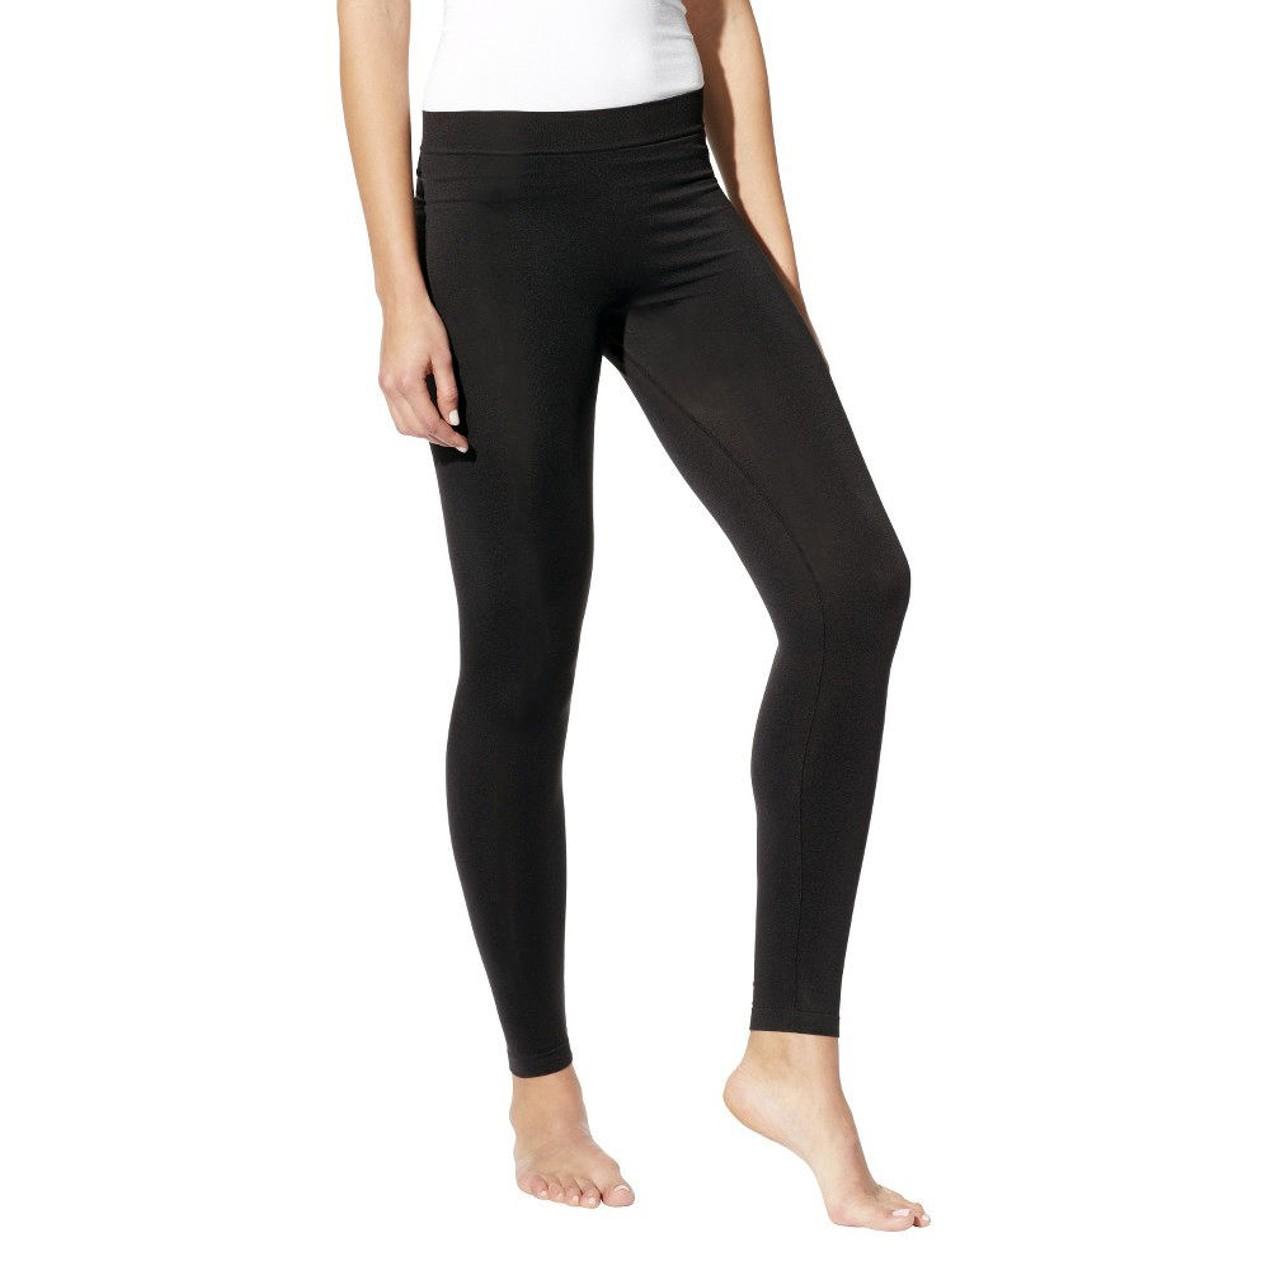 24442971ff4b5 Hanes Women's Long 'n Lean Black Leggings - Tanga